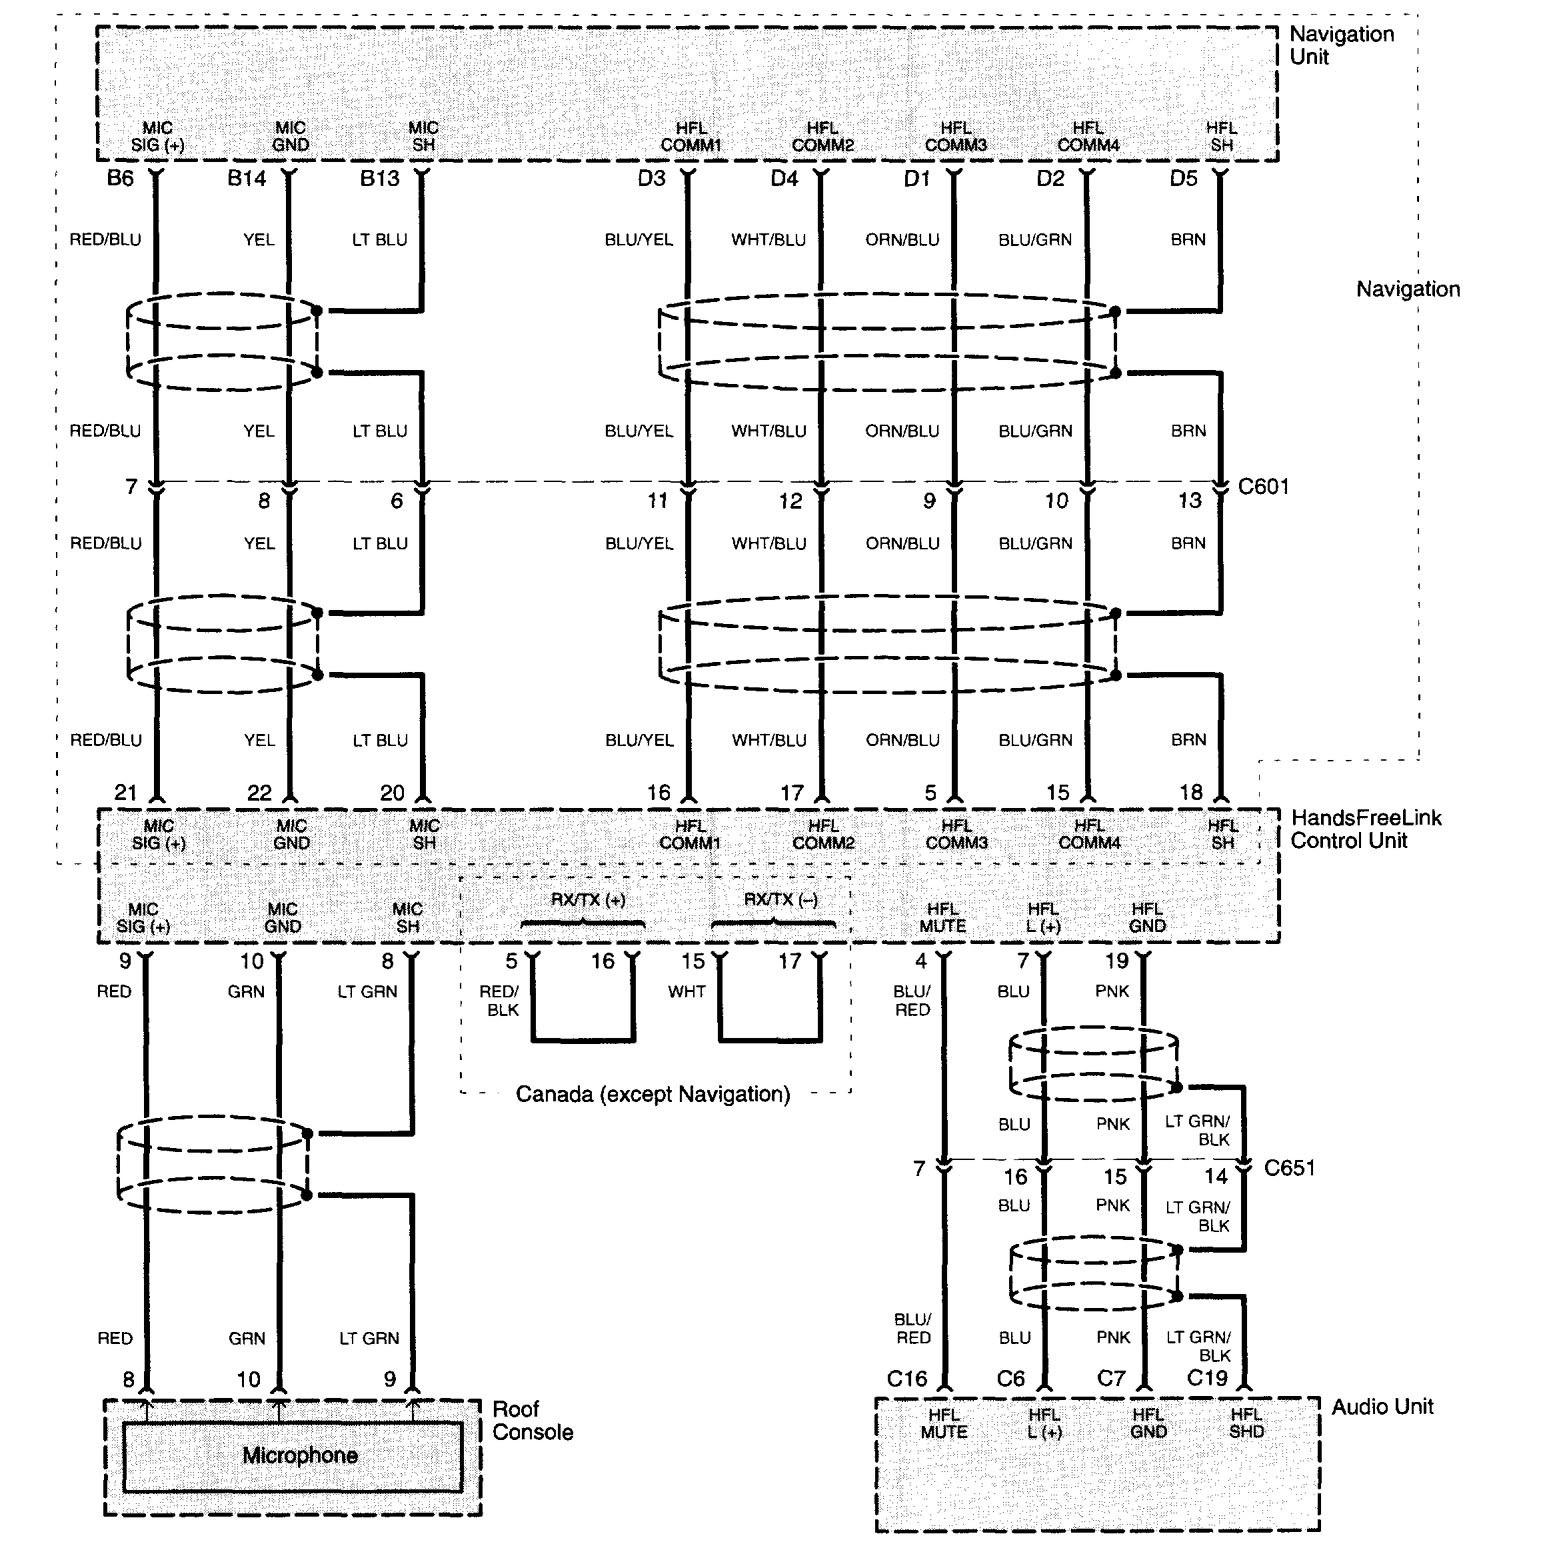 [DIAGRAM] 2008 Acura Tl Wiring Diagram Systems FULL